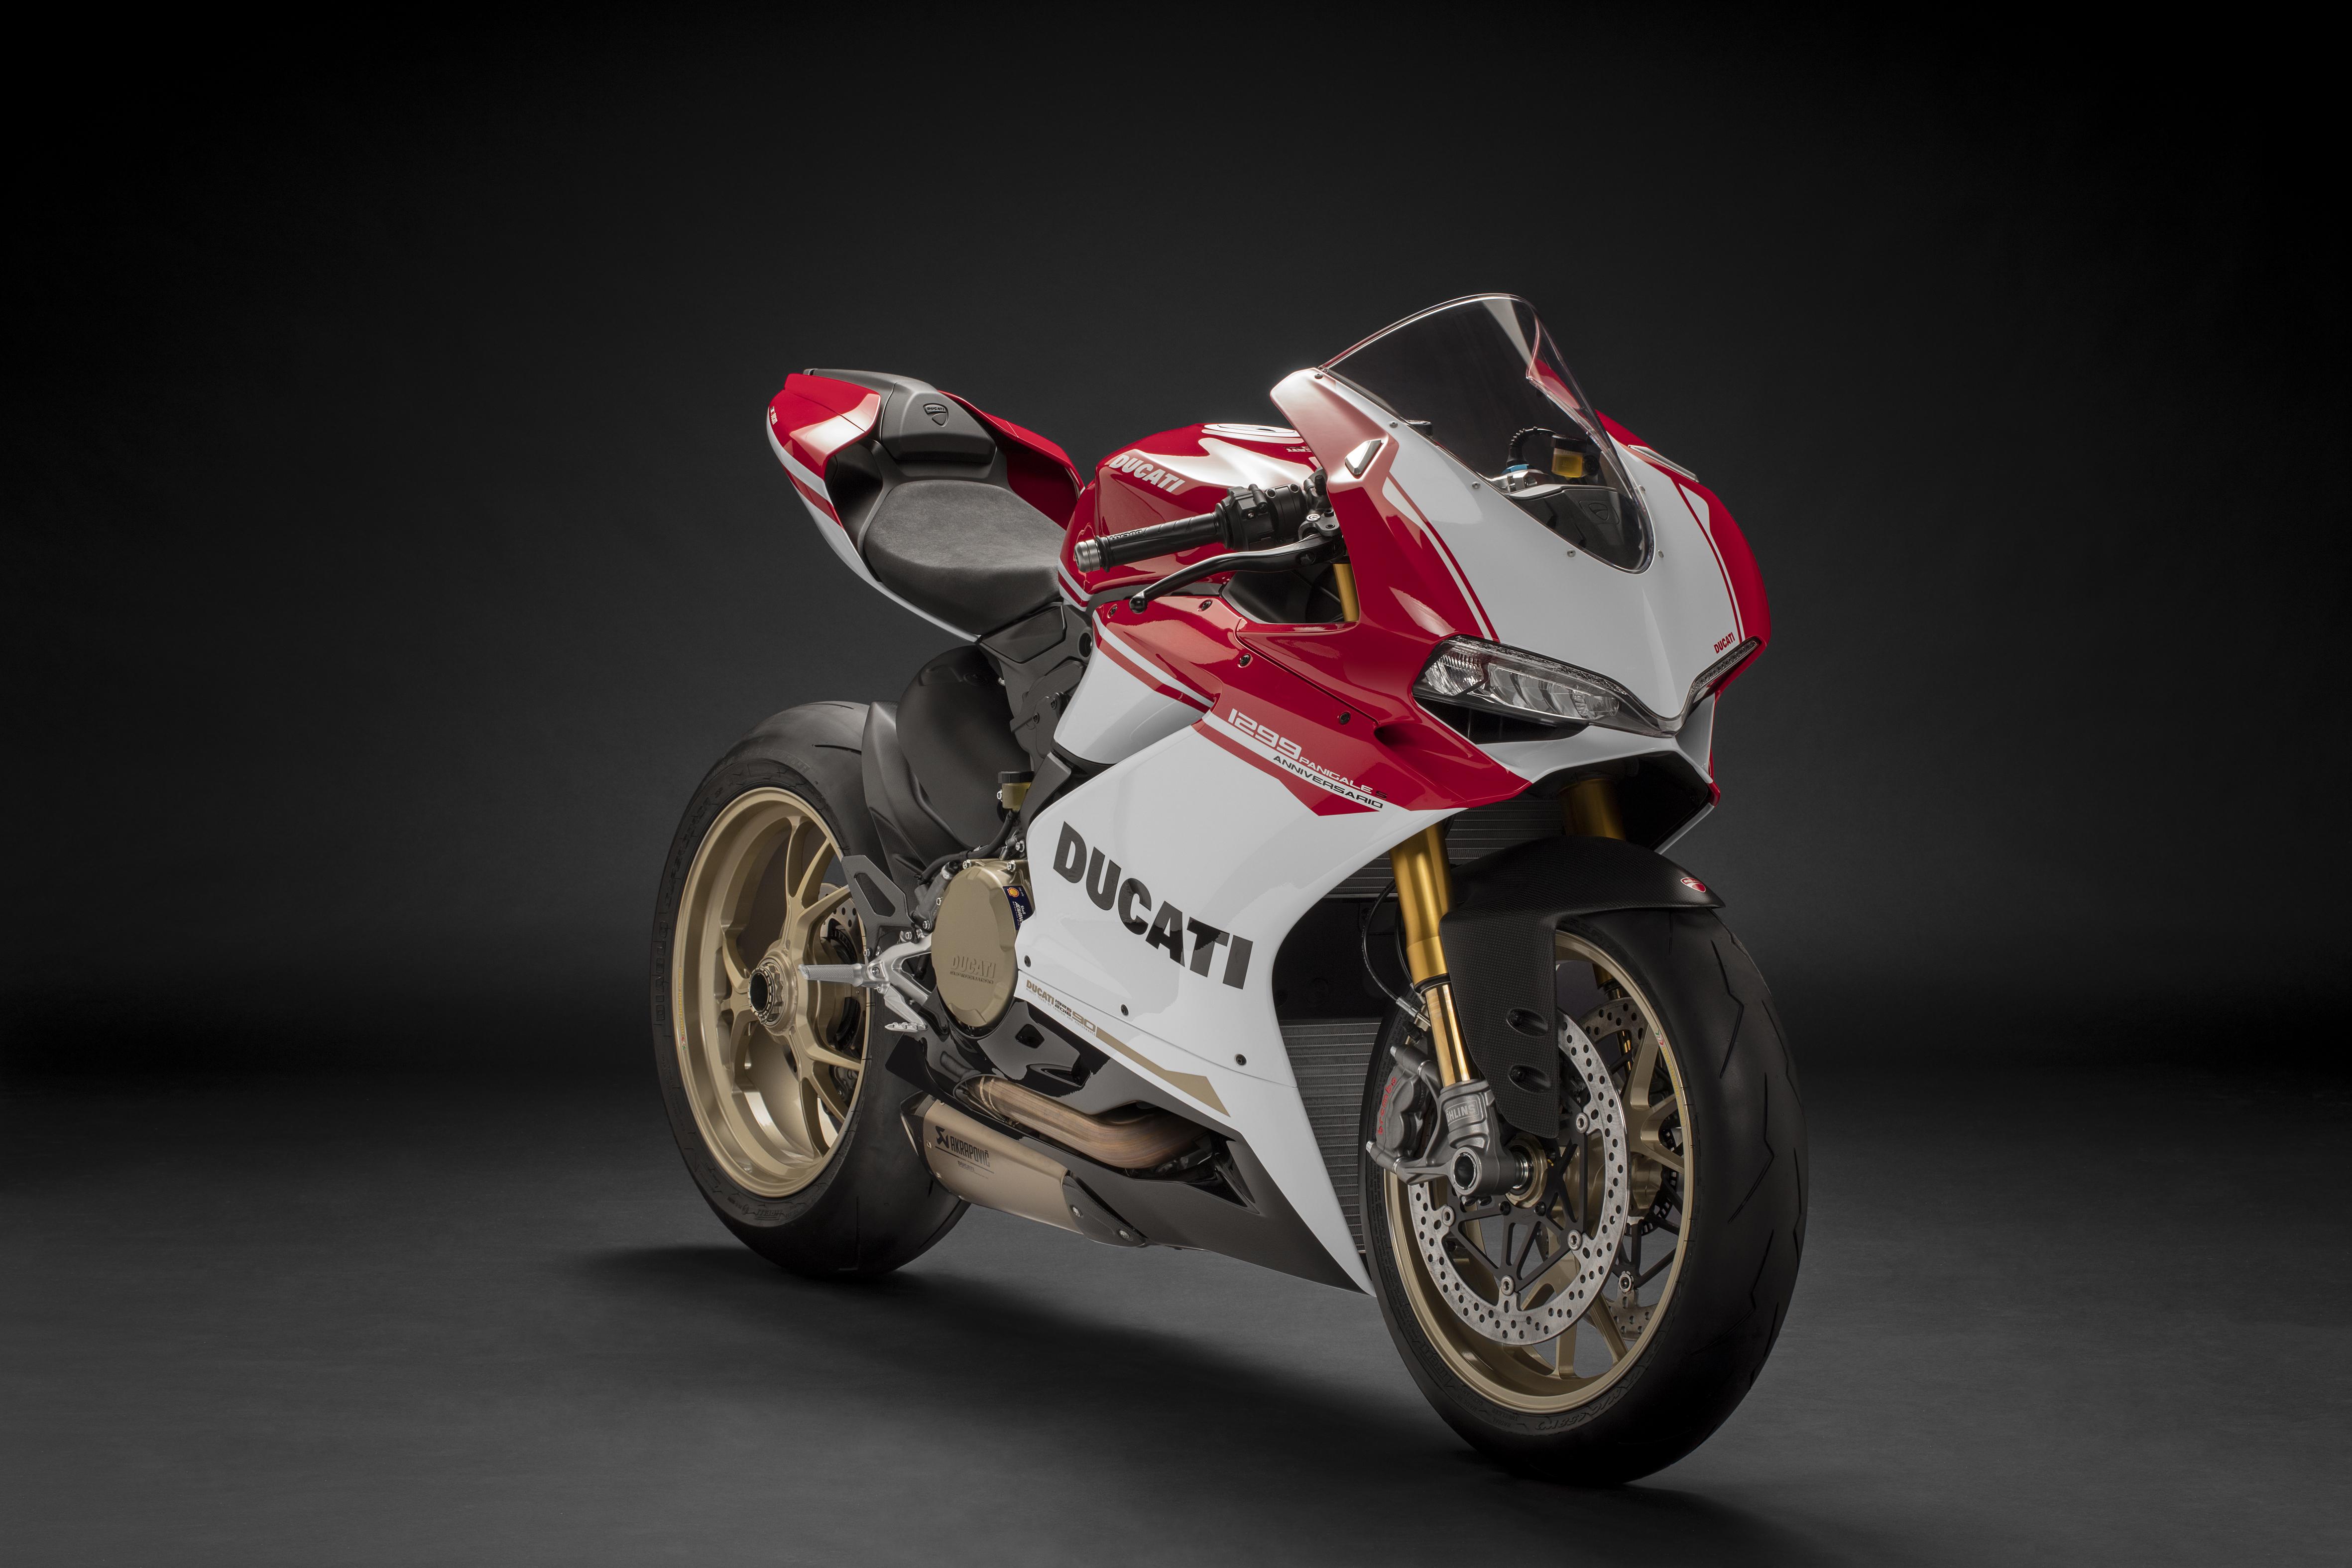 Ducati Limited Edition Bikes